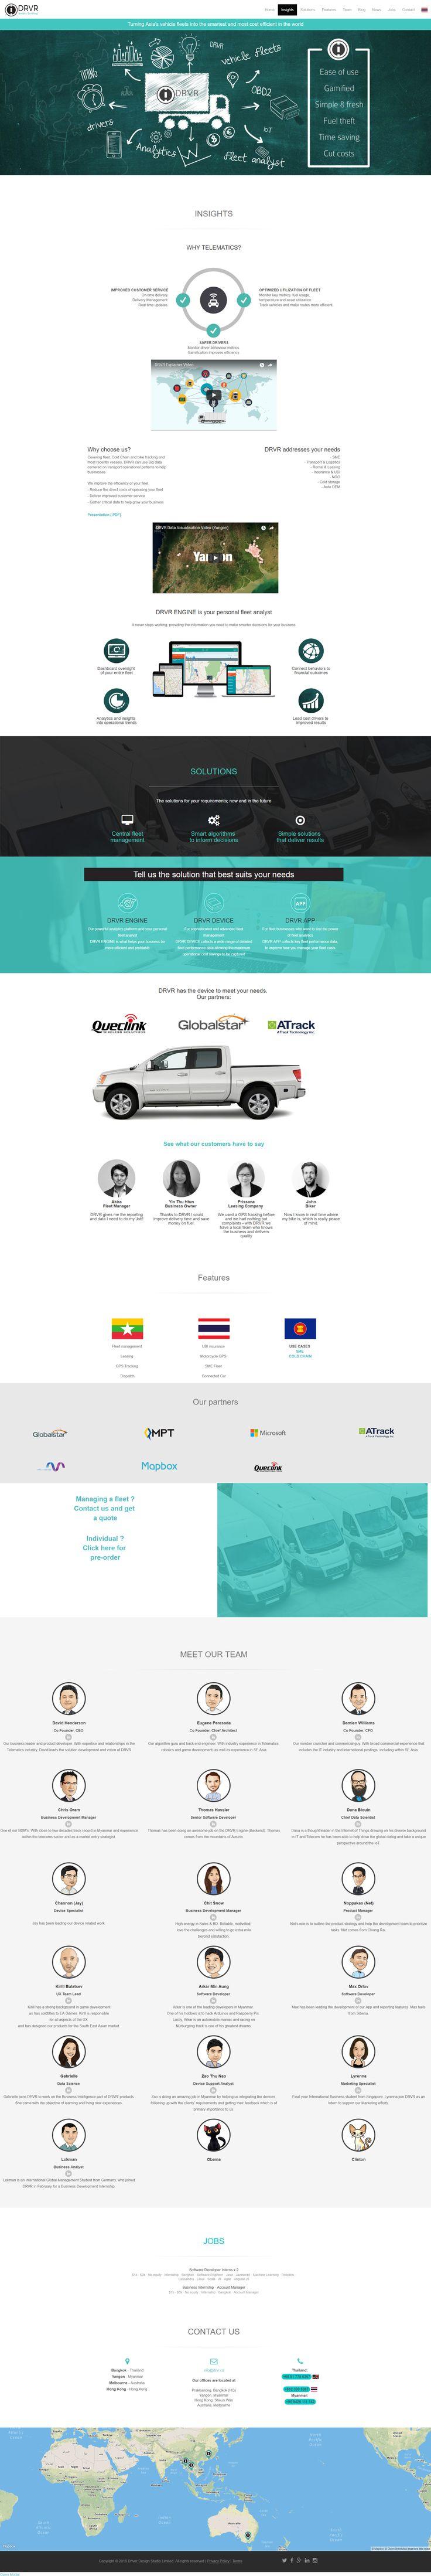 Website design - Fleet Analytics